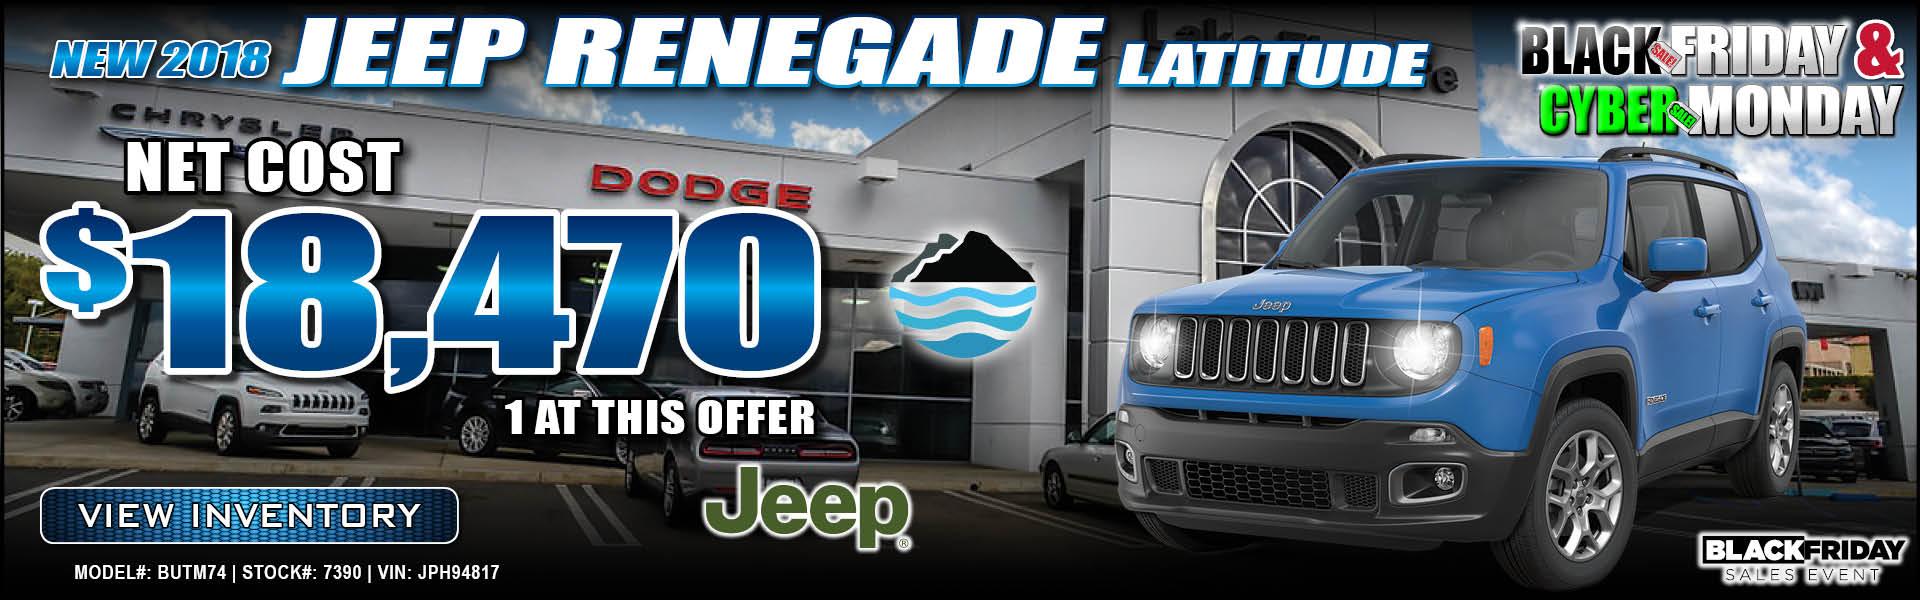 Jeep Renegade $18,470